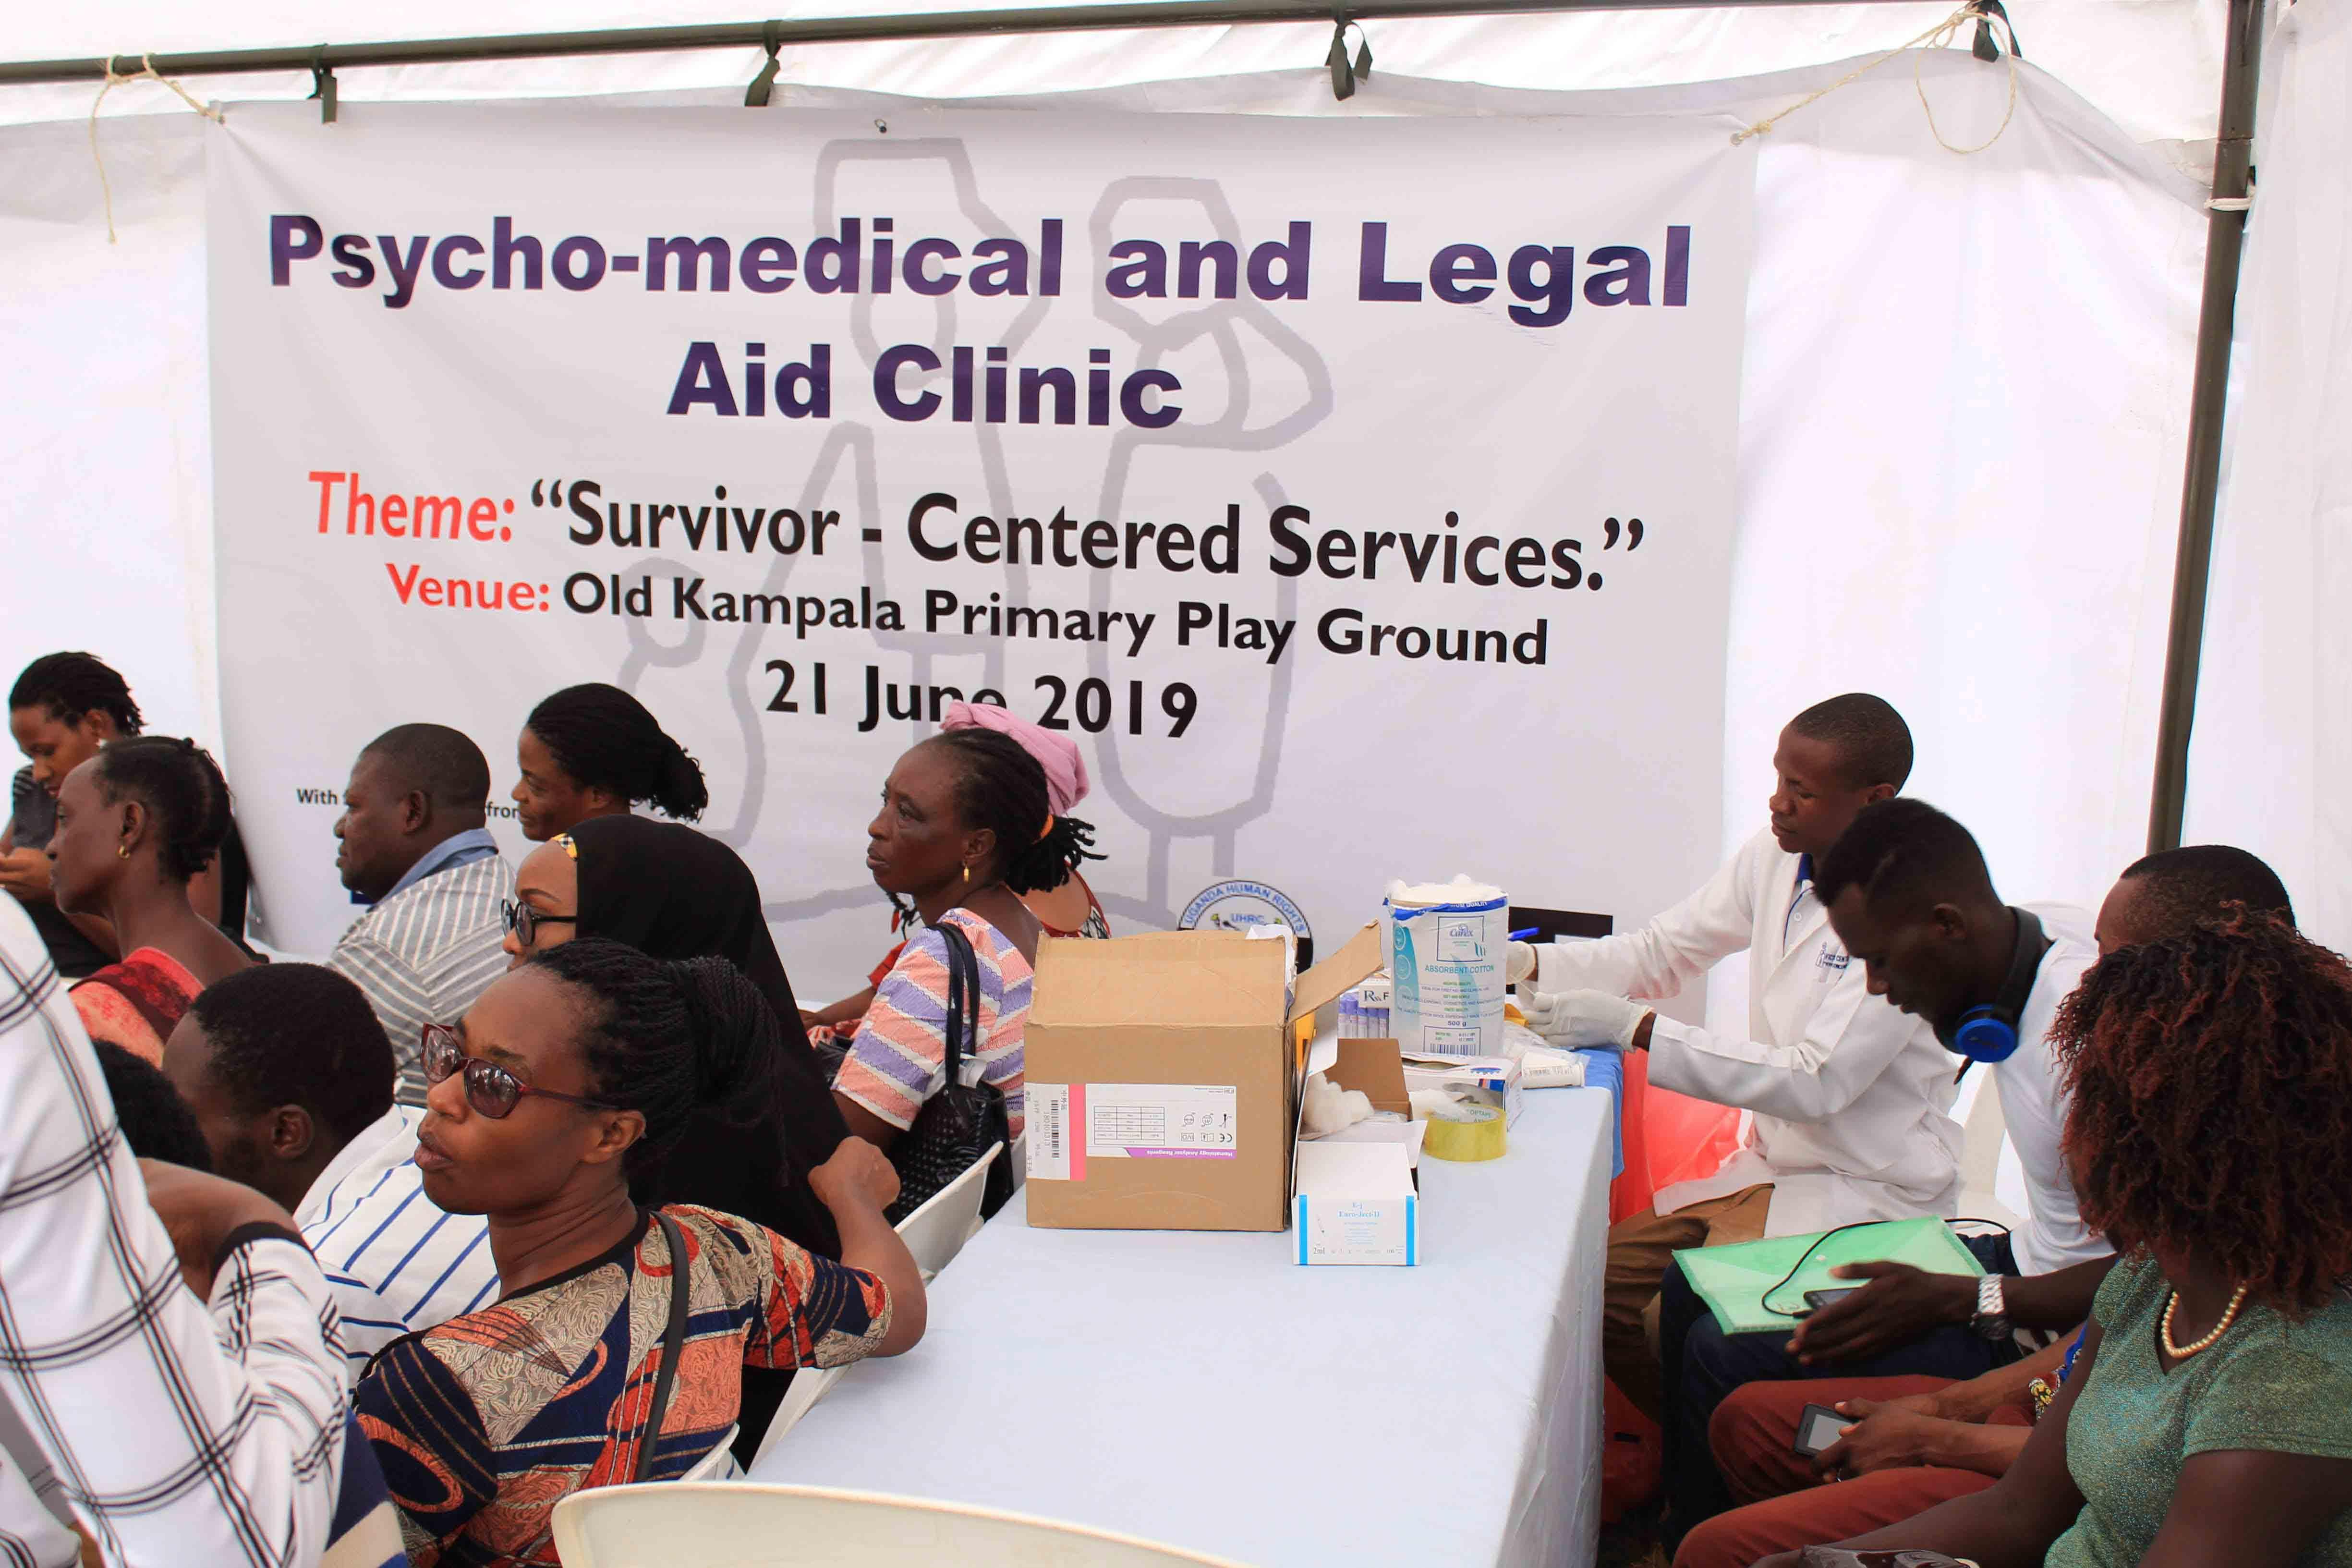 Participants waiting for medical examination